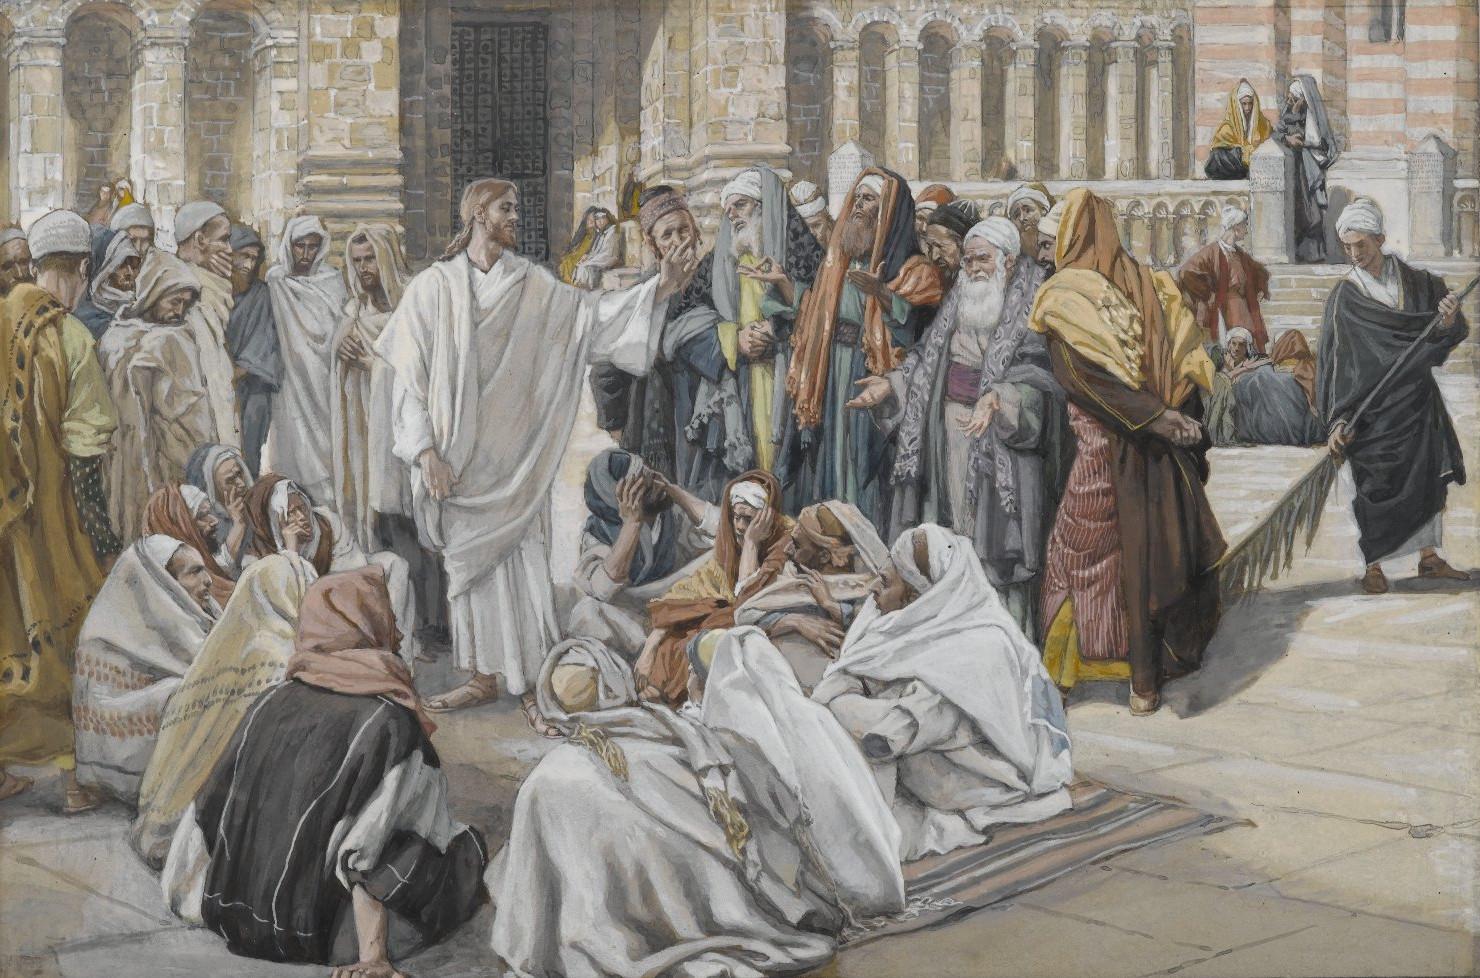 CHURCH TALK: Living a contagious Christian life